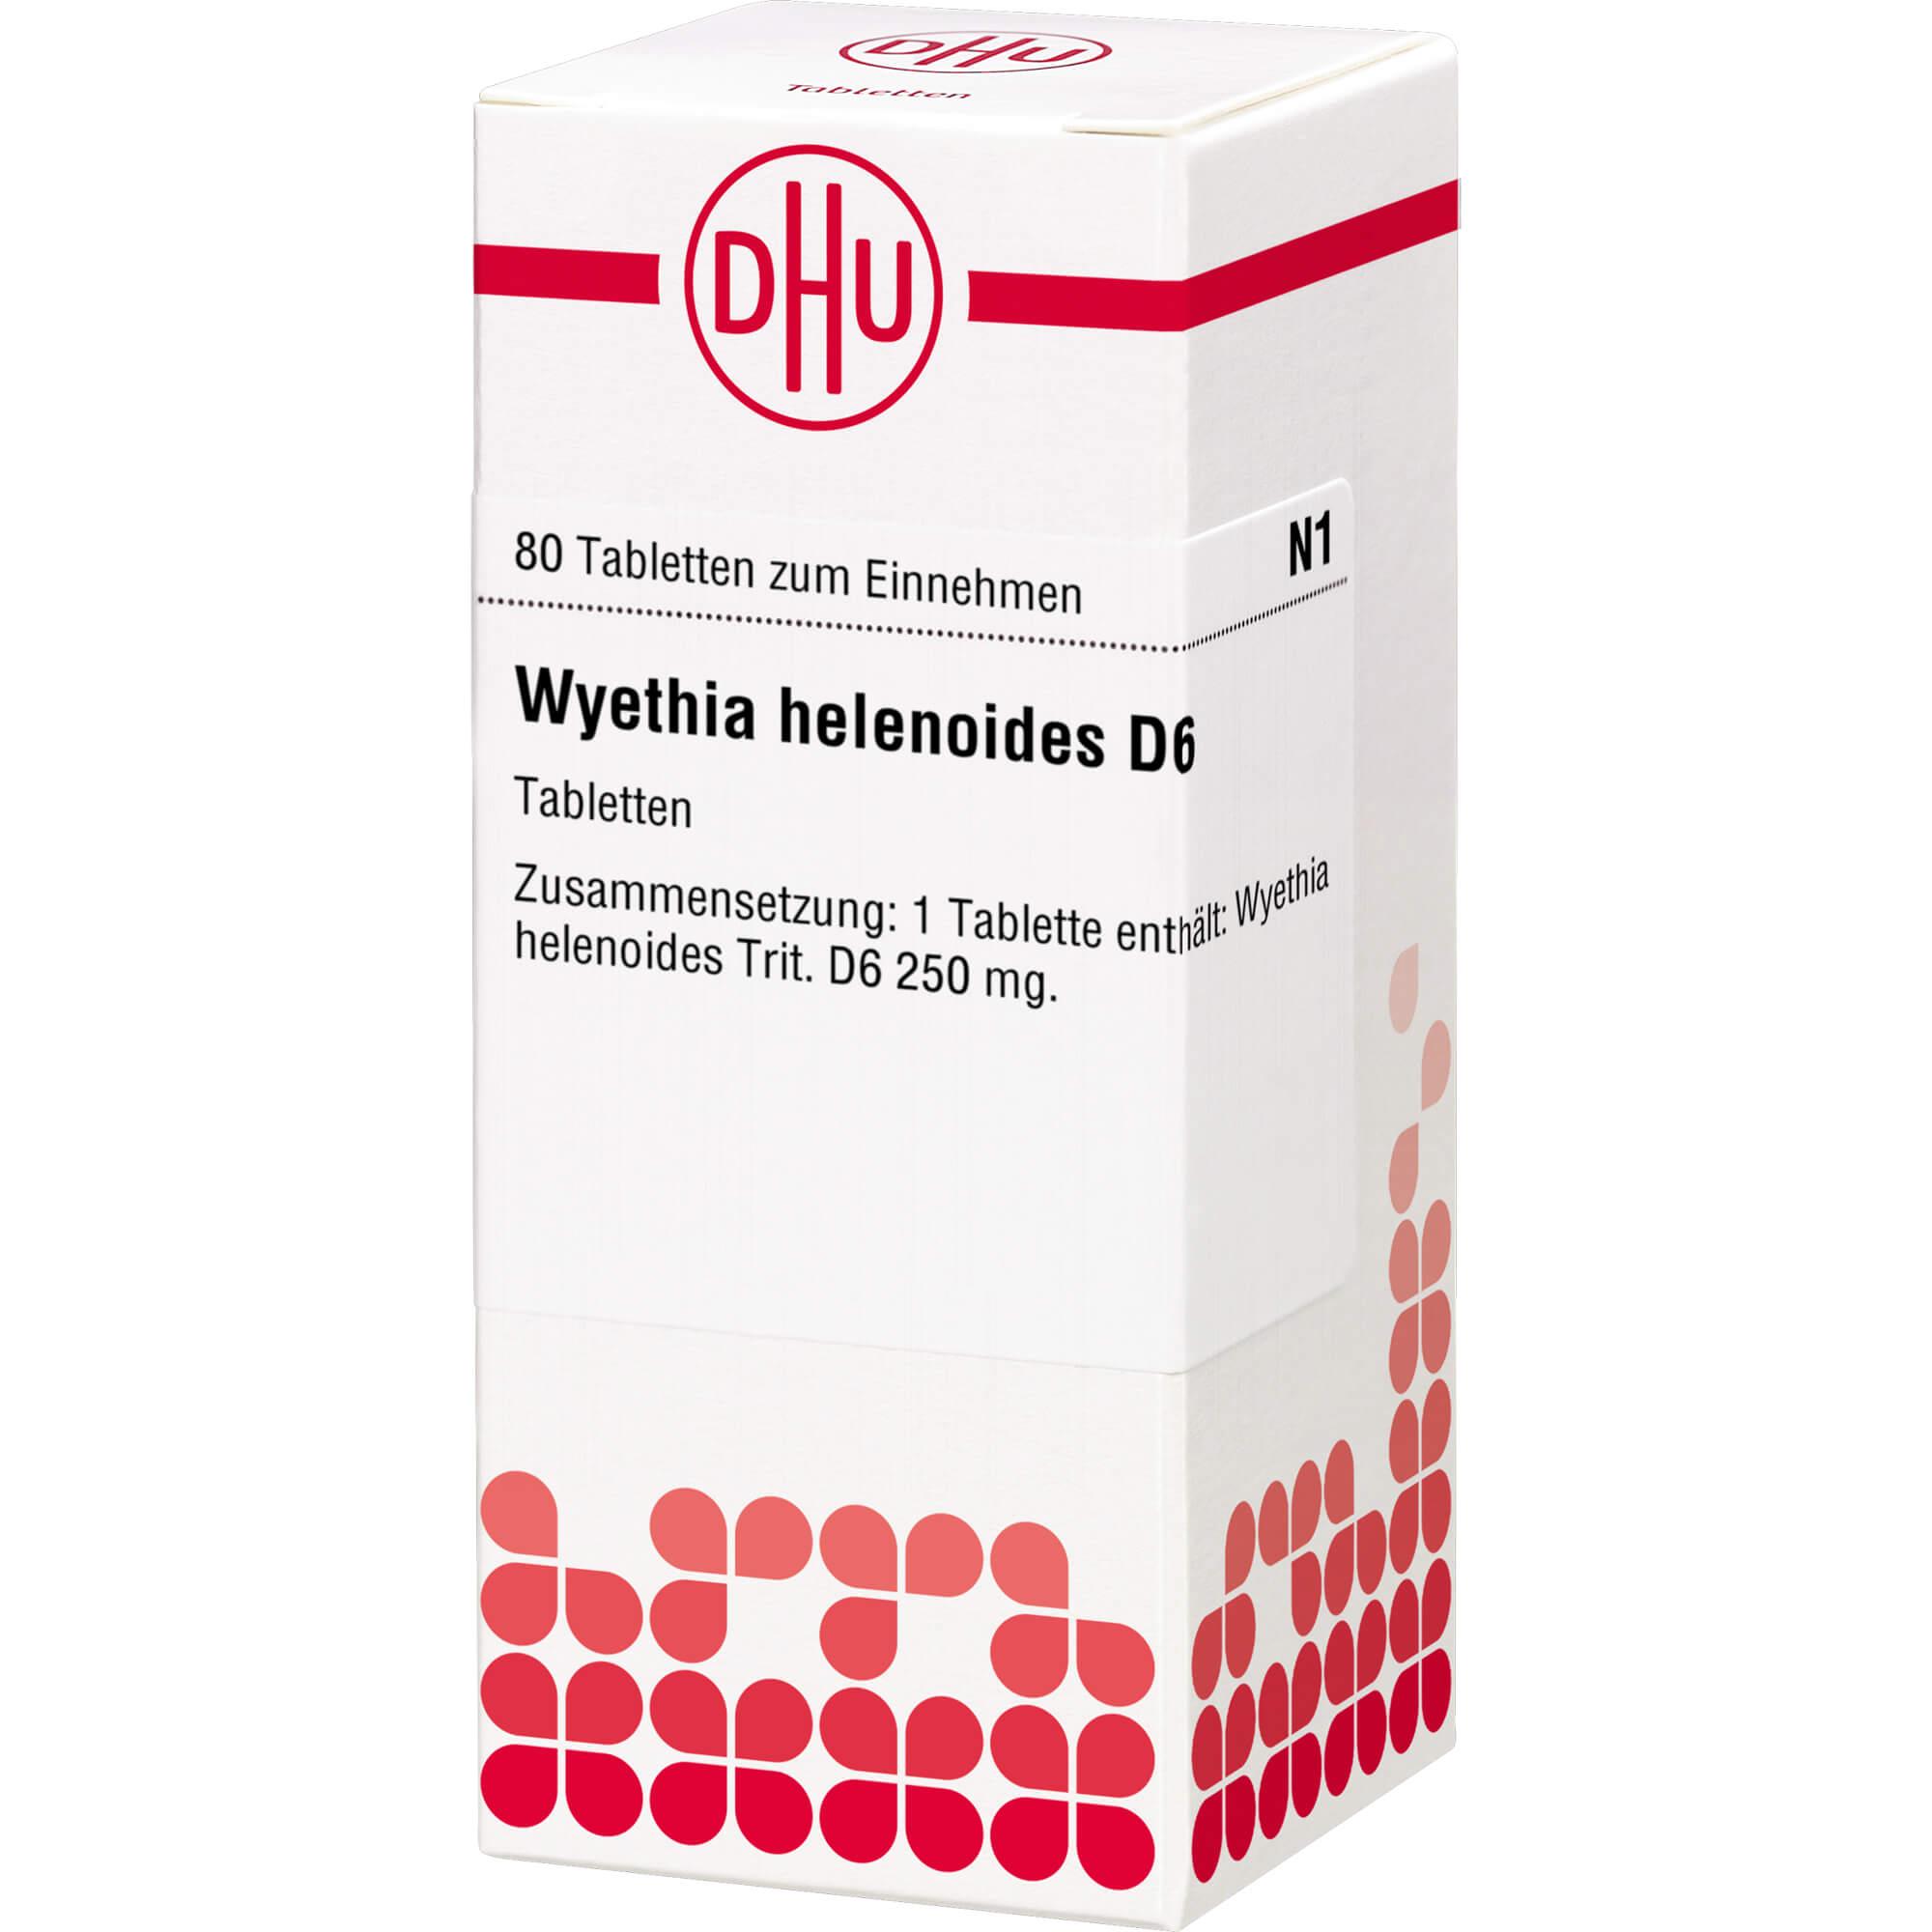 WYETHIA HELENIOIDES D 6 Tabletten